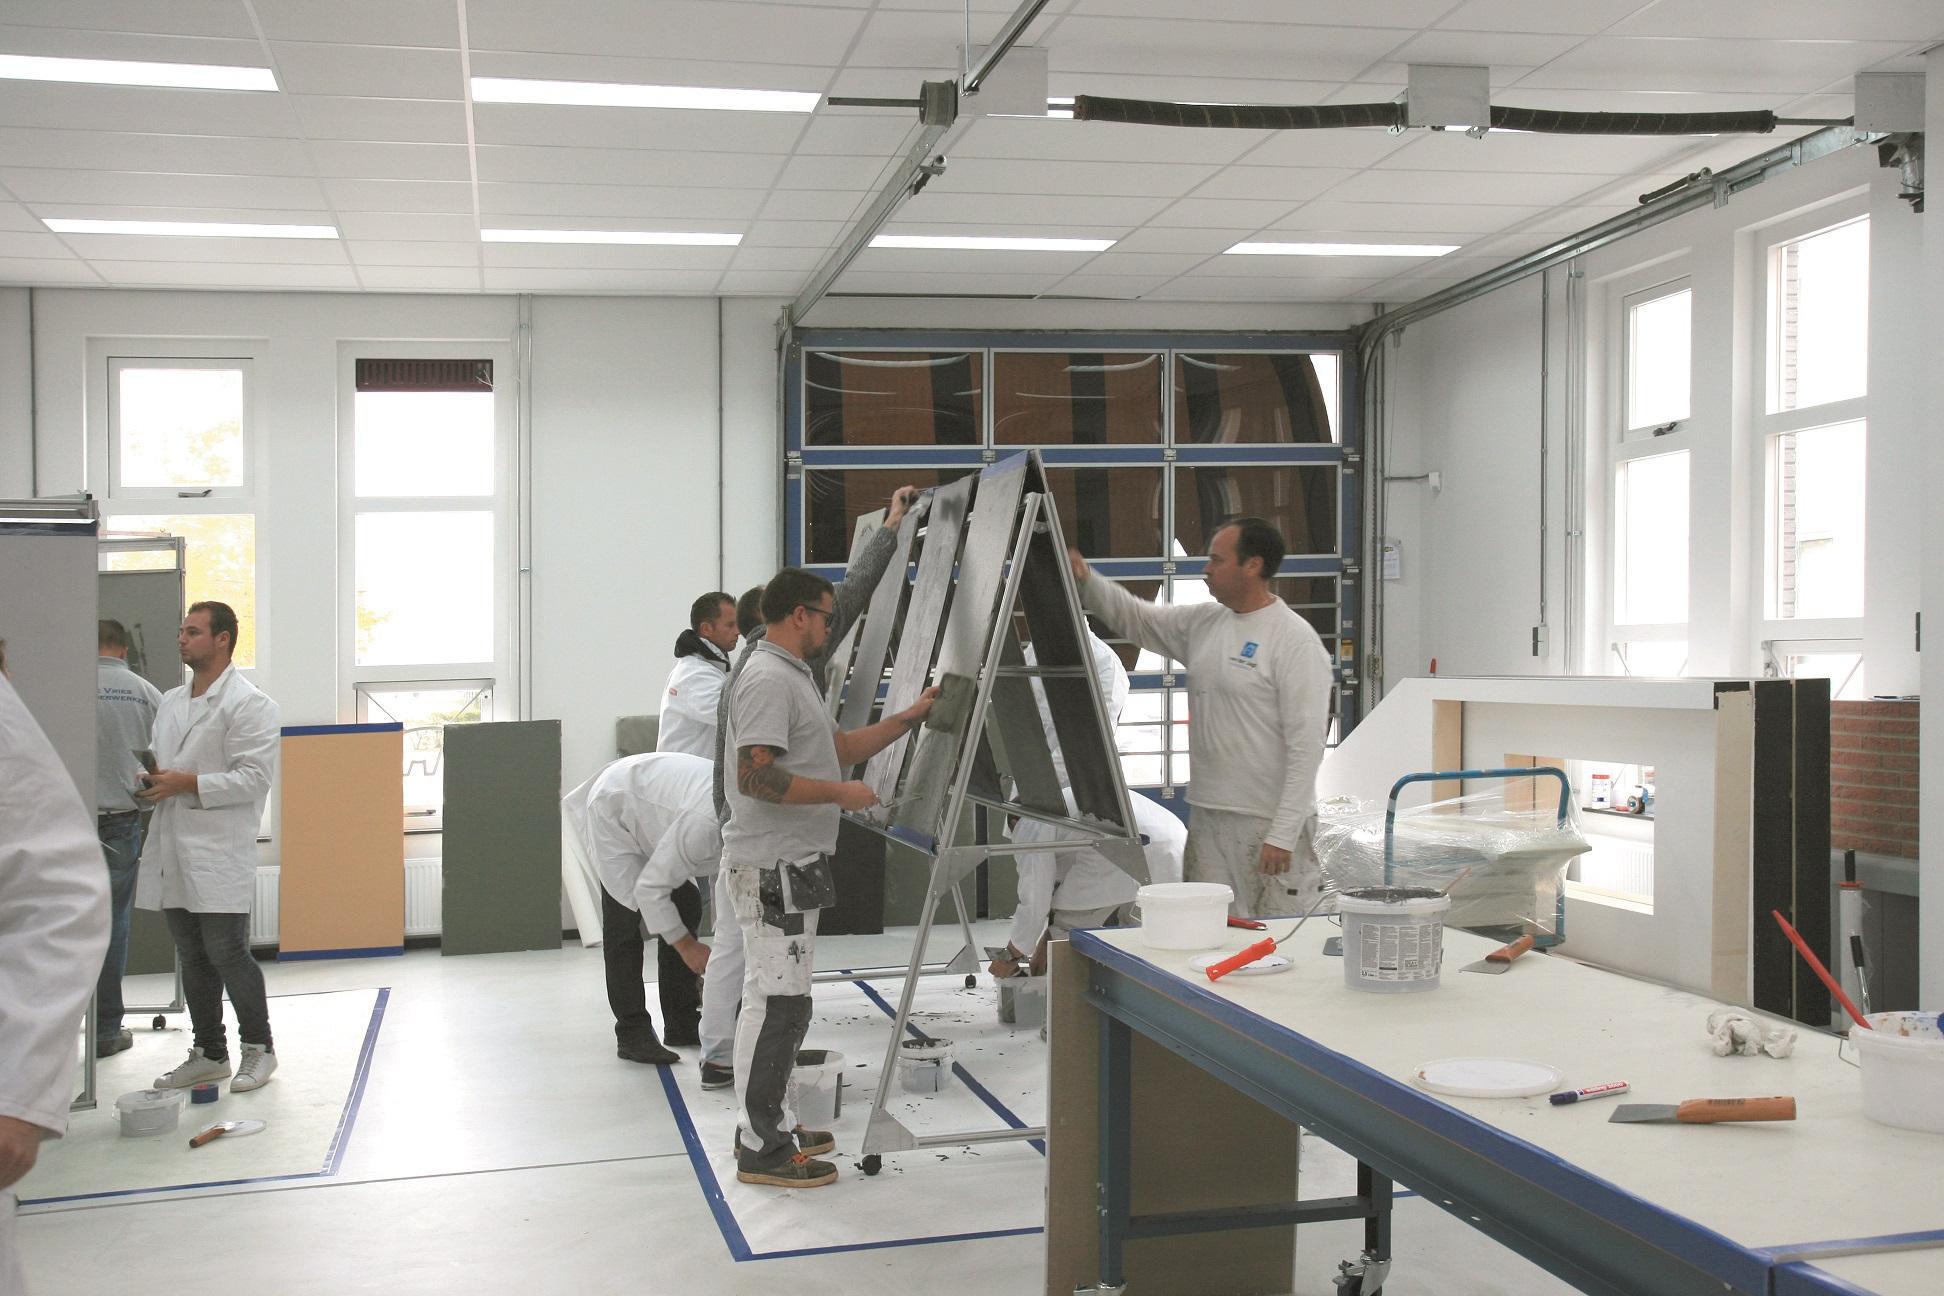 Vernieuwd opleidingsprogramma Caparol - architectenweb.nl